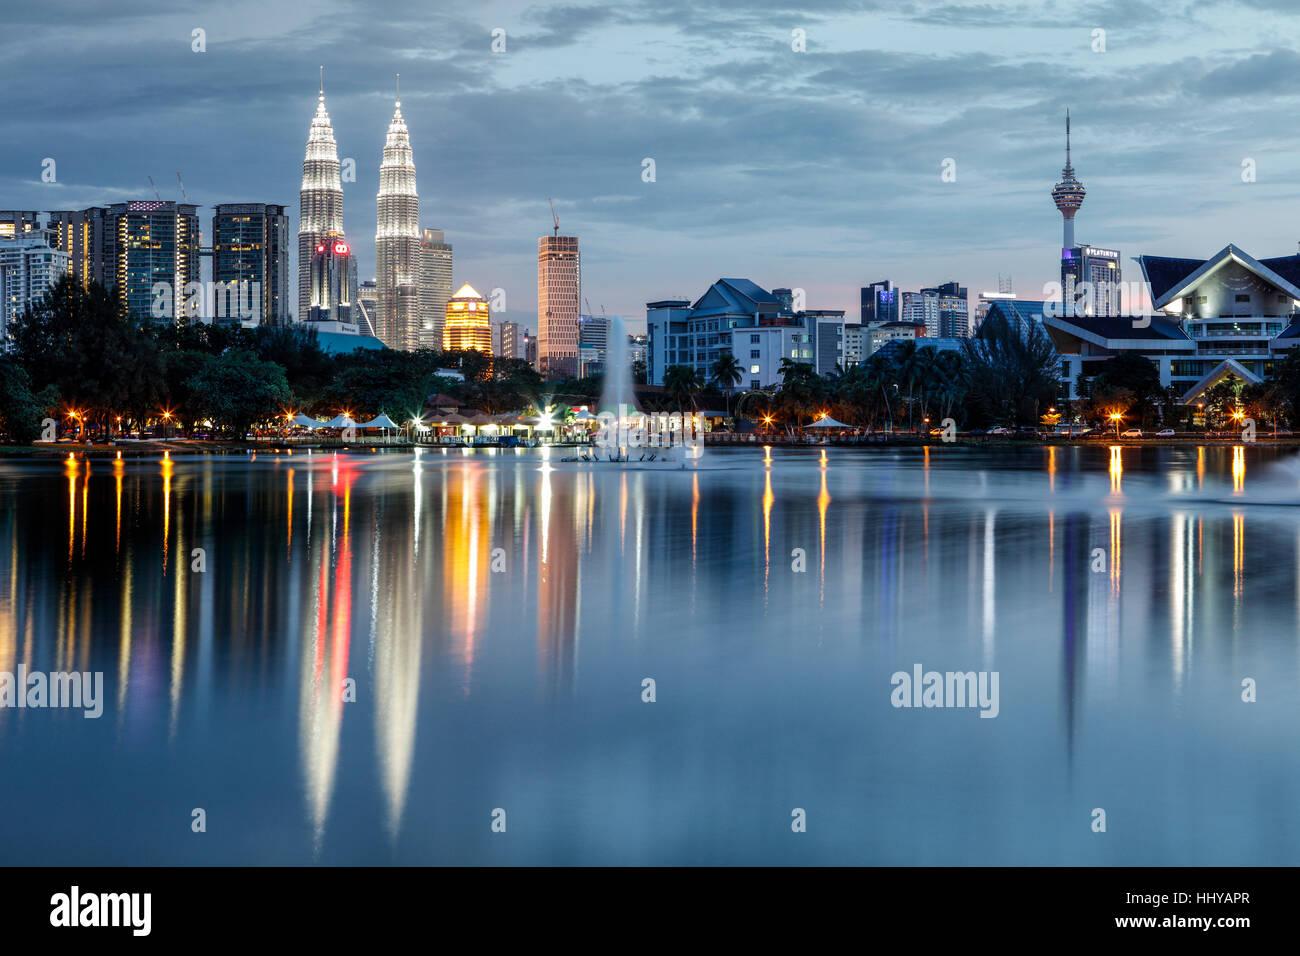 Il Kuala Lumpur skyline al tramonto. Immagini Stock